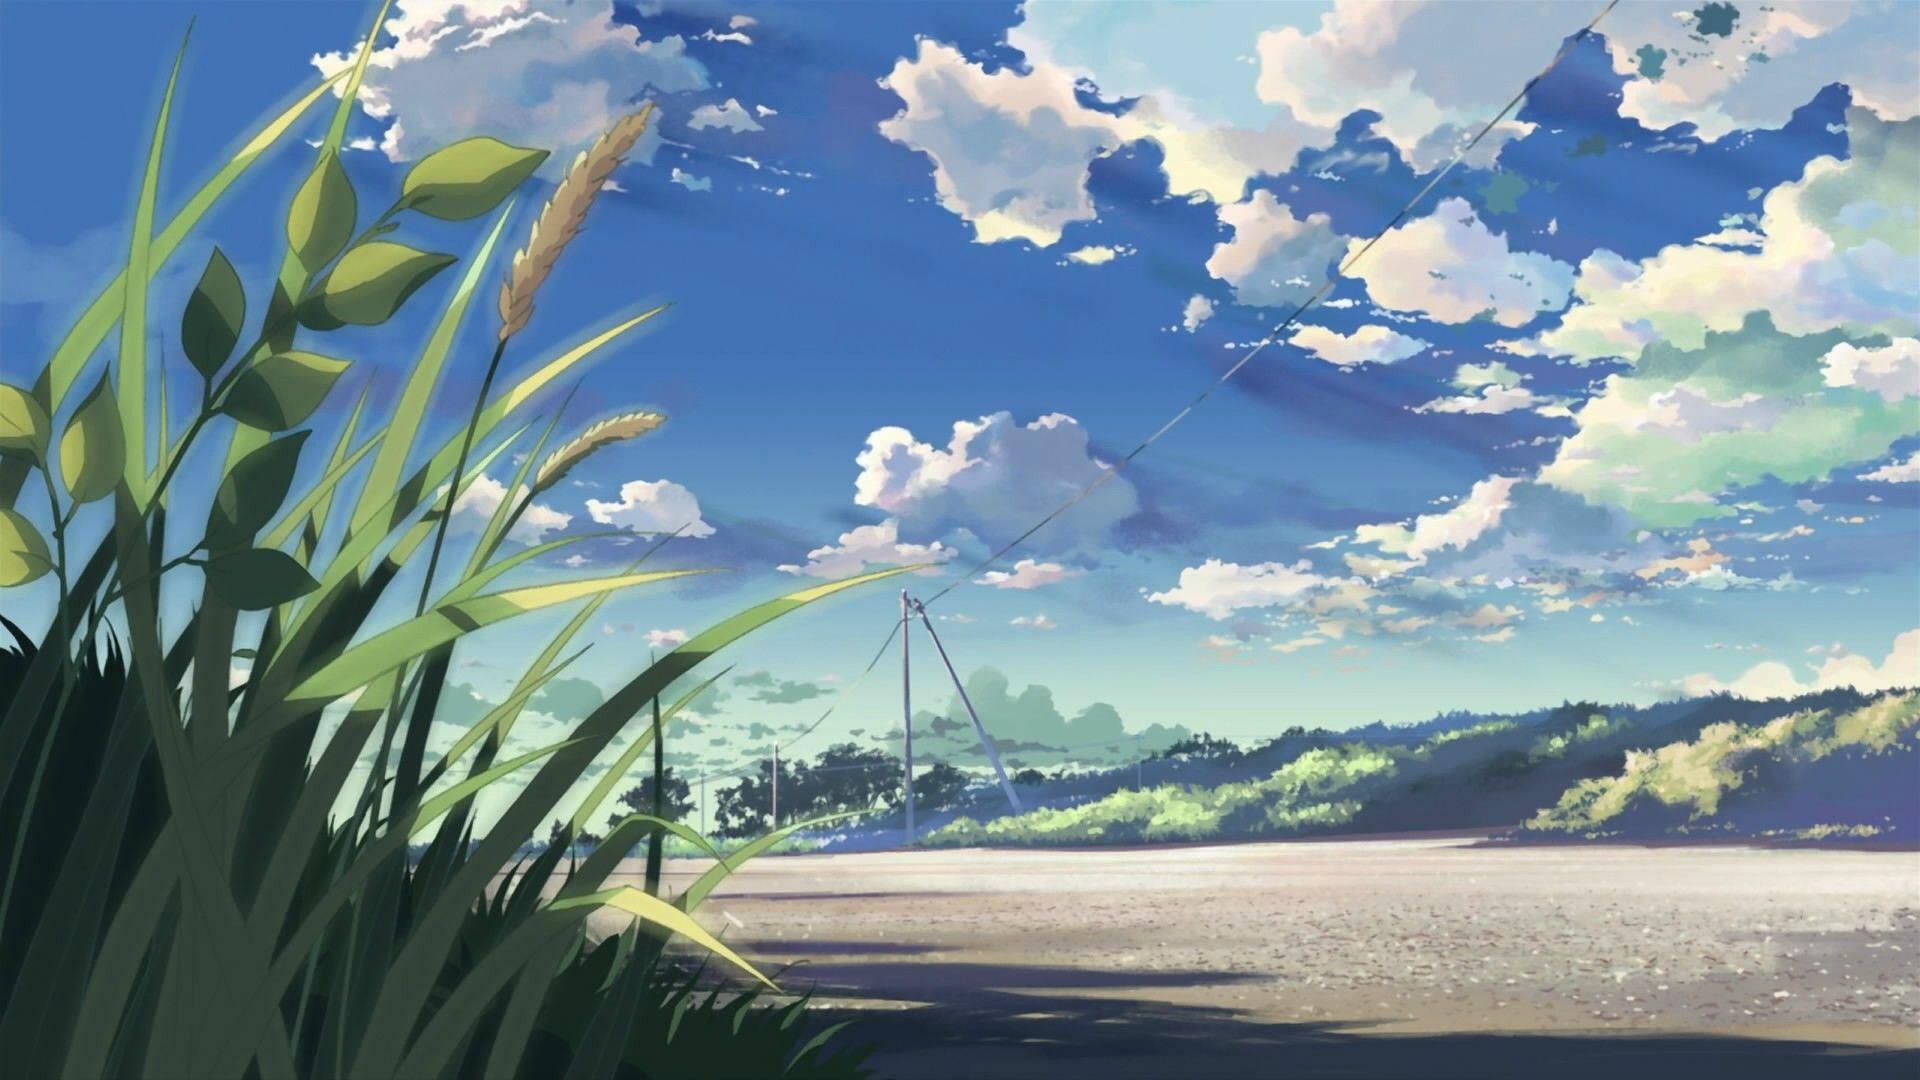 More Discrete Anime Wallpapers Anime Scenery Wallpaper Anime Scenery Scenery Wallpaper